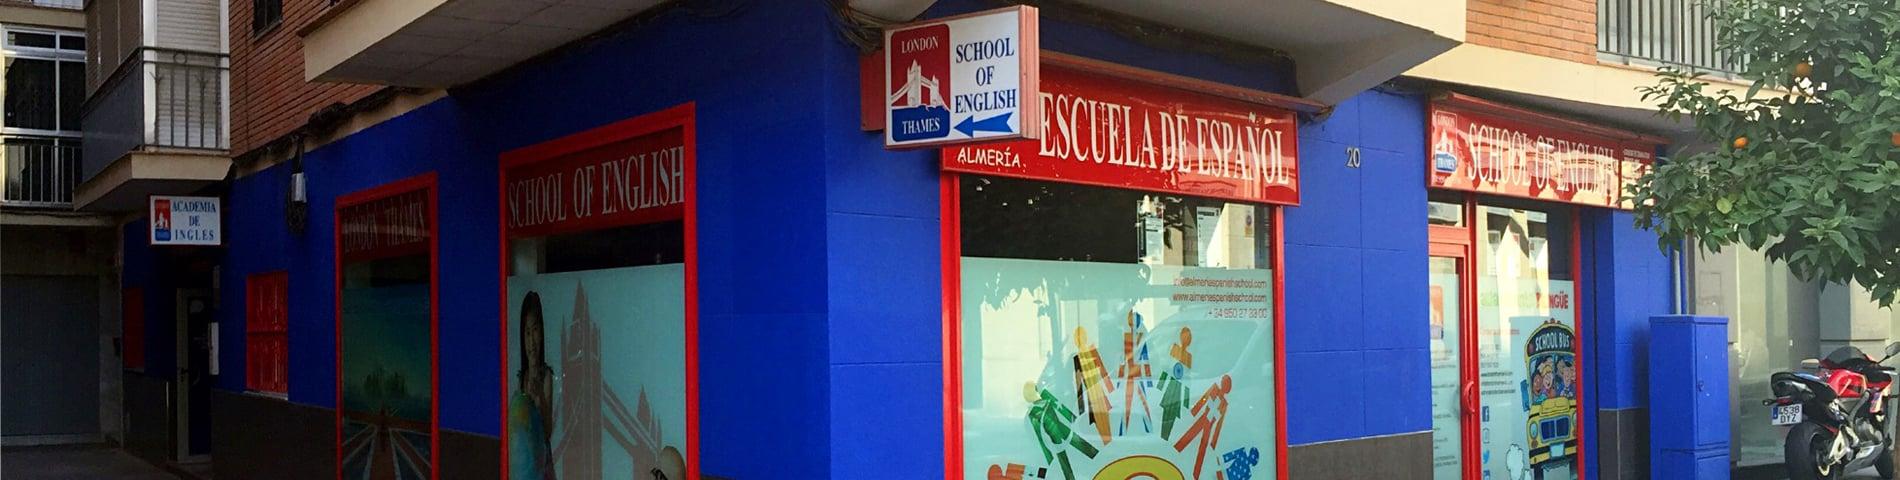 Almeria Spanish School kép 1